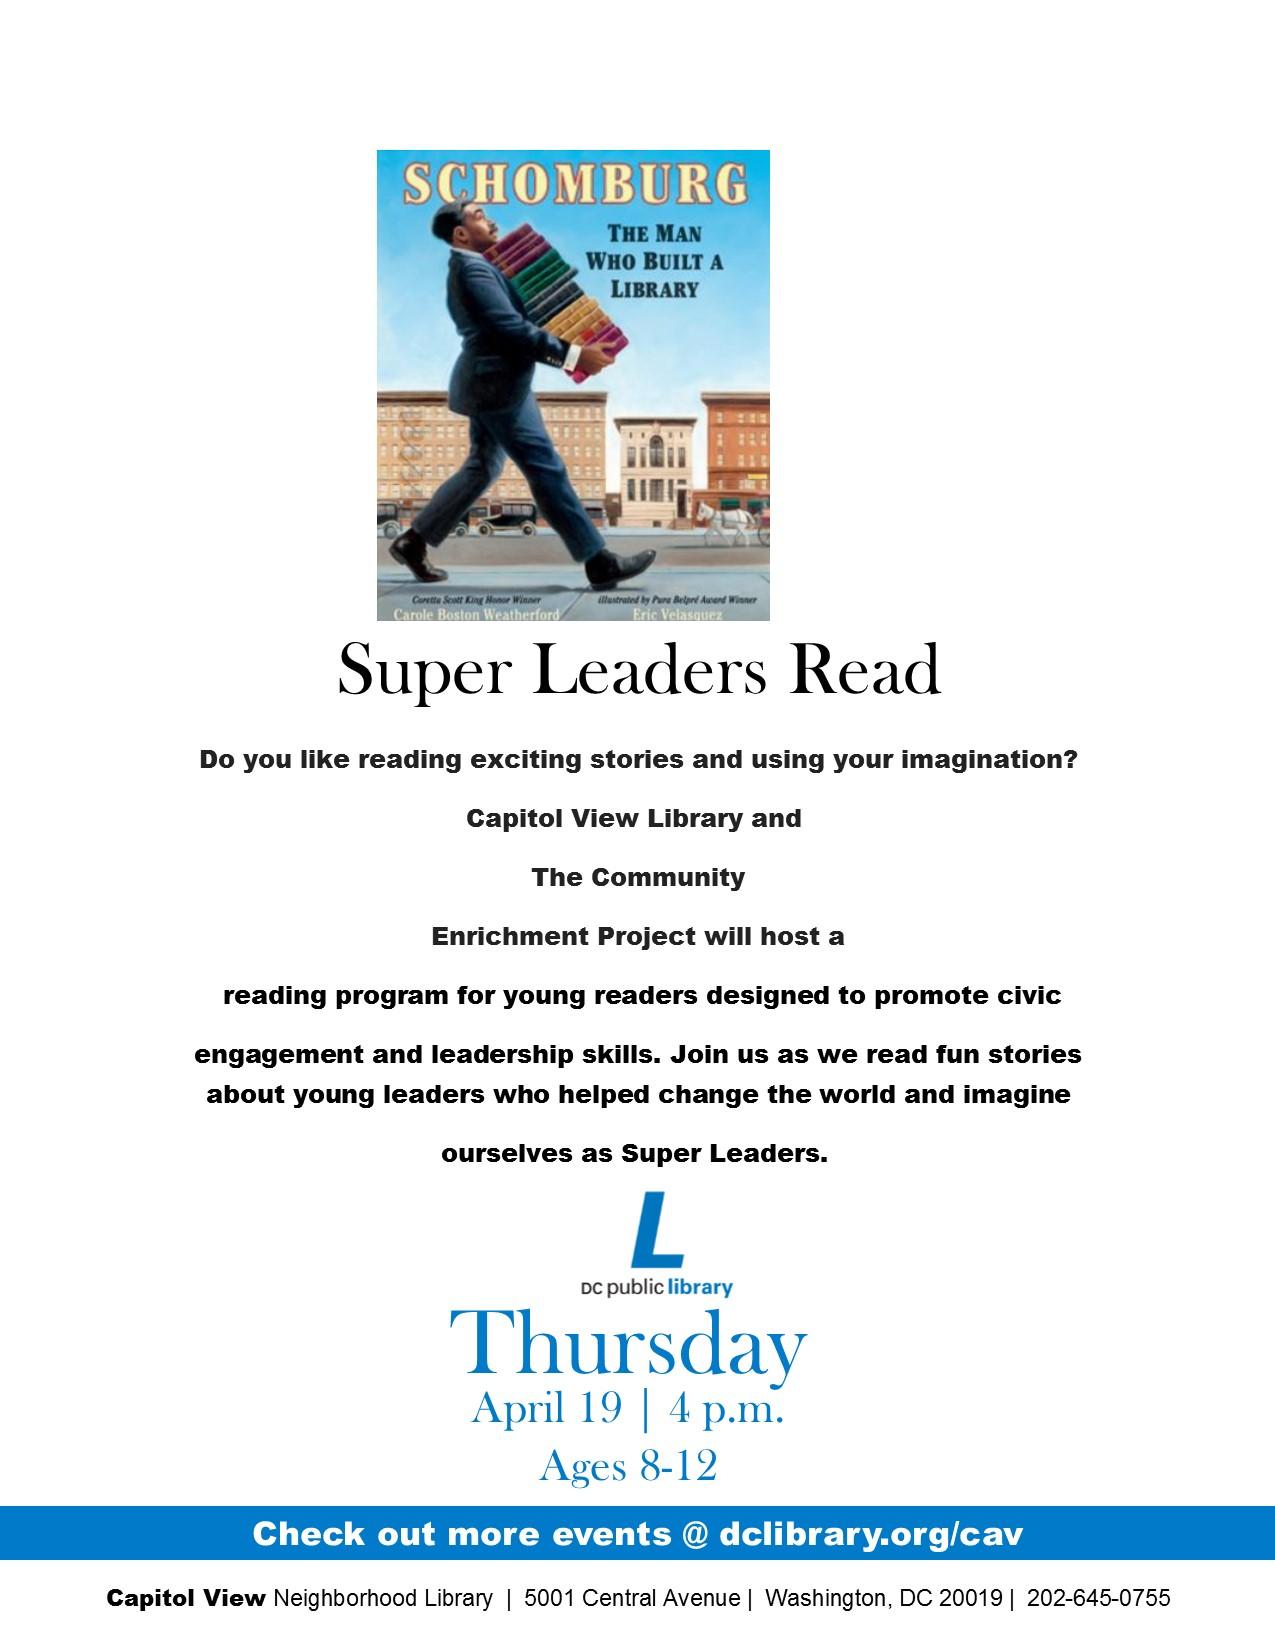 Super Leaders Read April 17 Schomburg (1).jpg